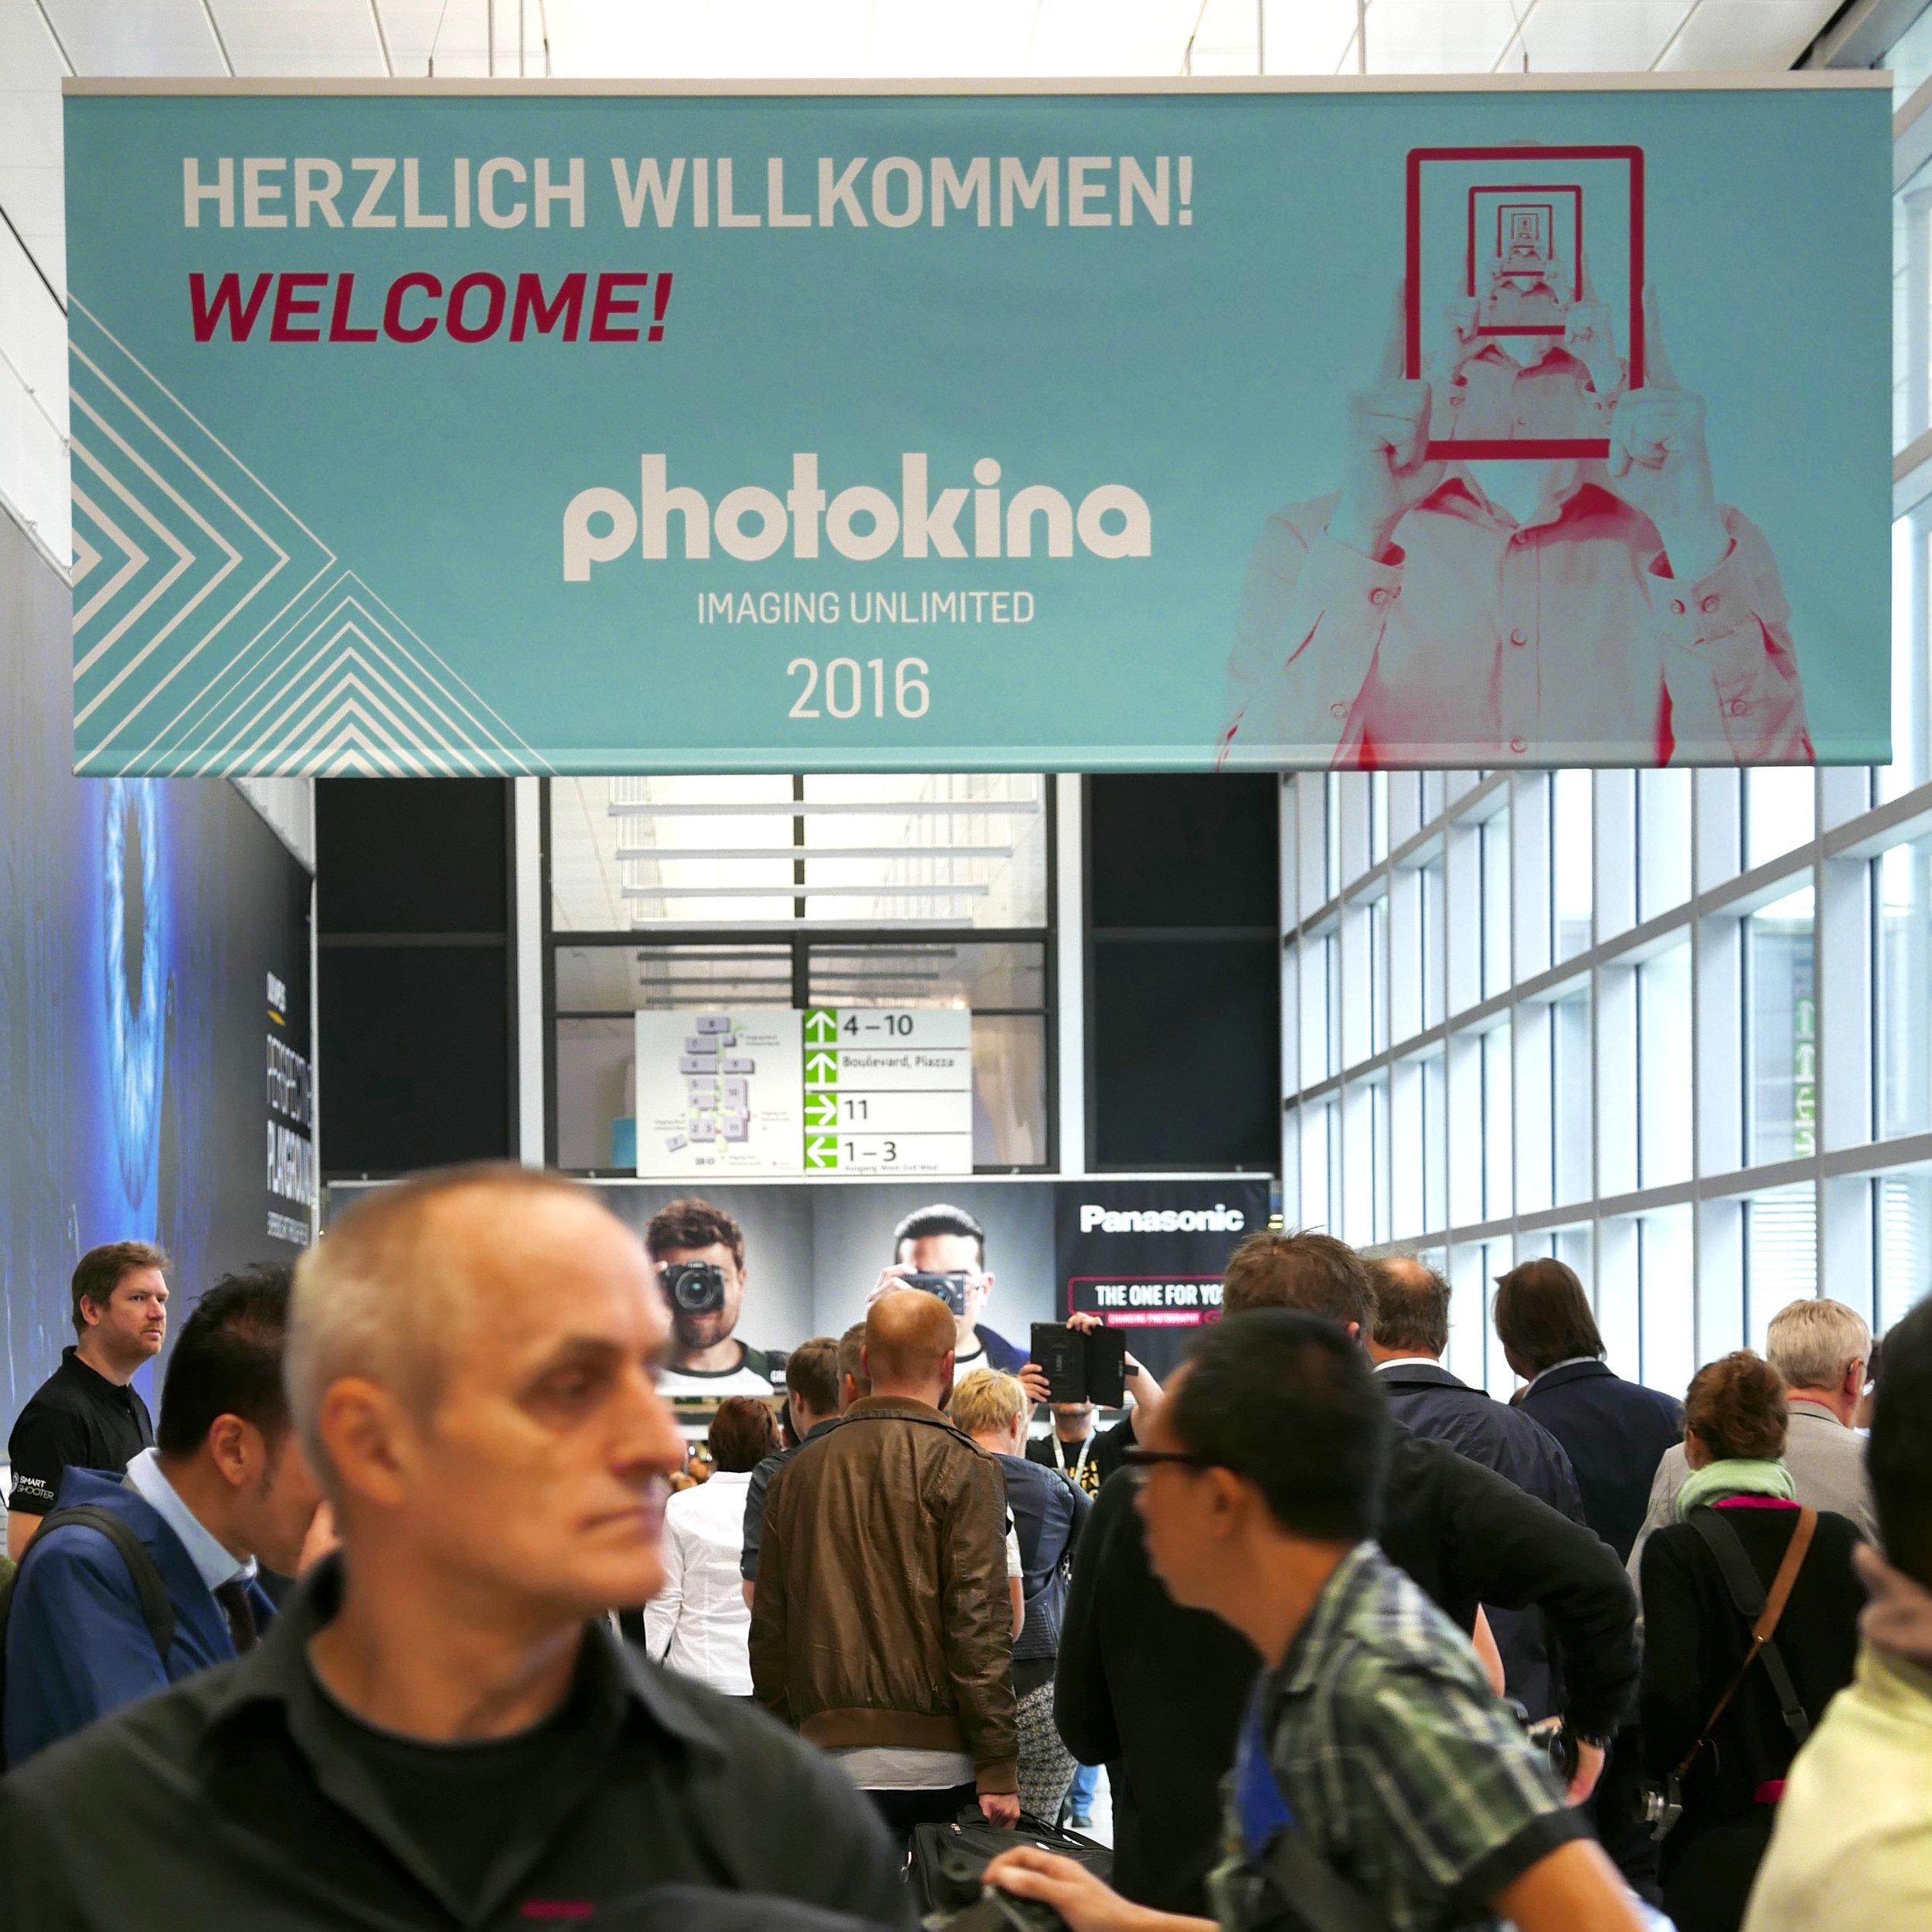 Welcome to Photokina 2016!